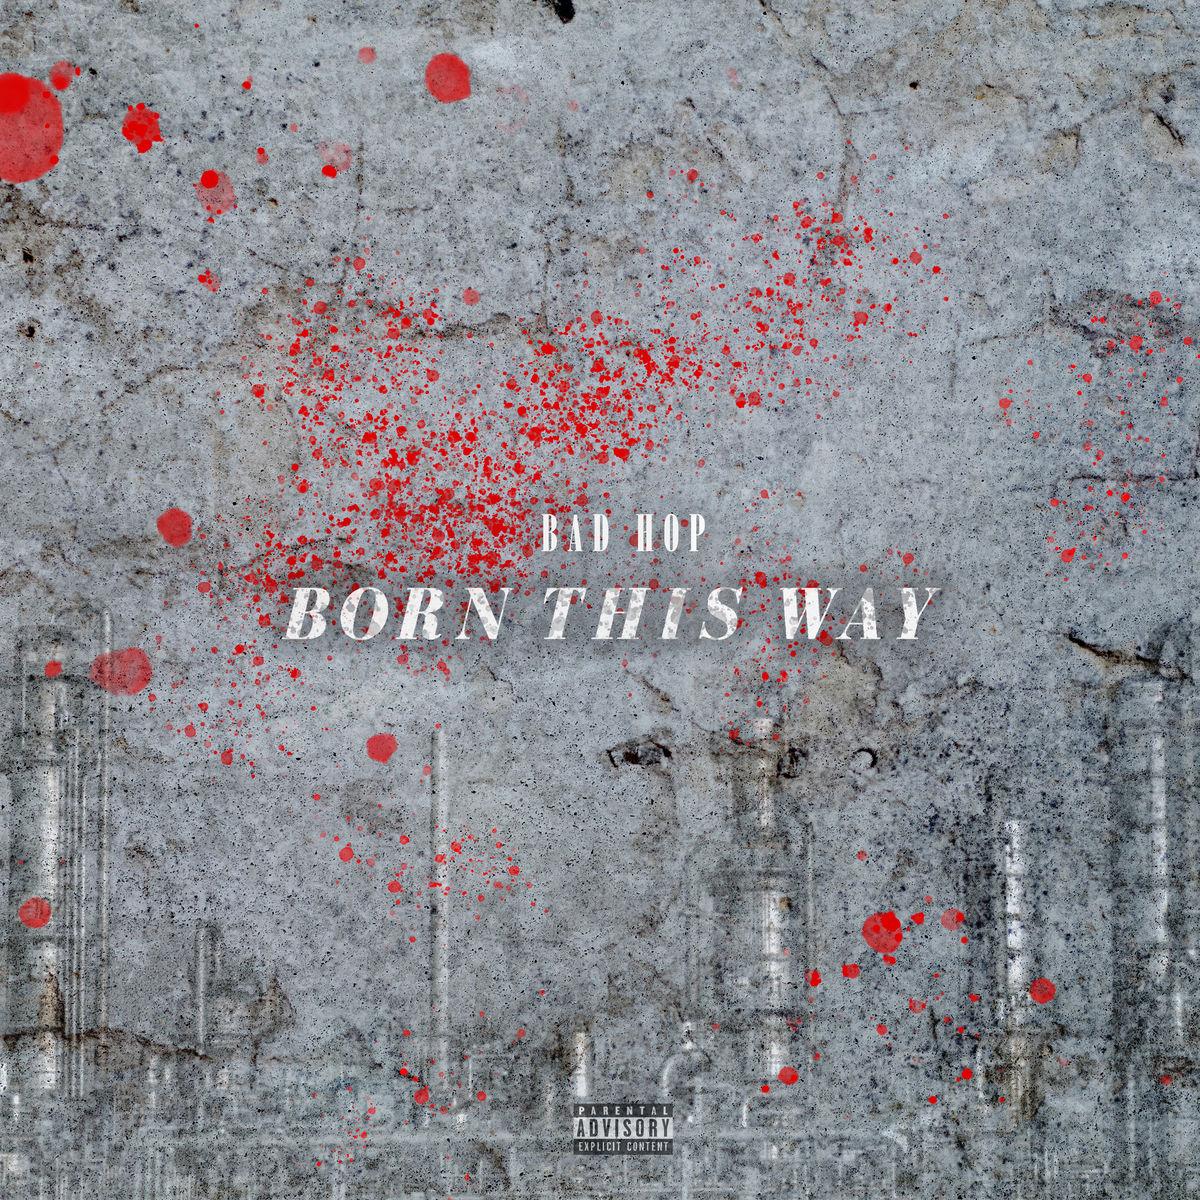 『BAD HOP - Born This Way (feat. YZERR, Vingo & Bark) 歌詞』収録の『Born This Way (feat. YZERR, Vingo & Bark)』ジャケット